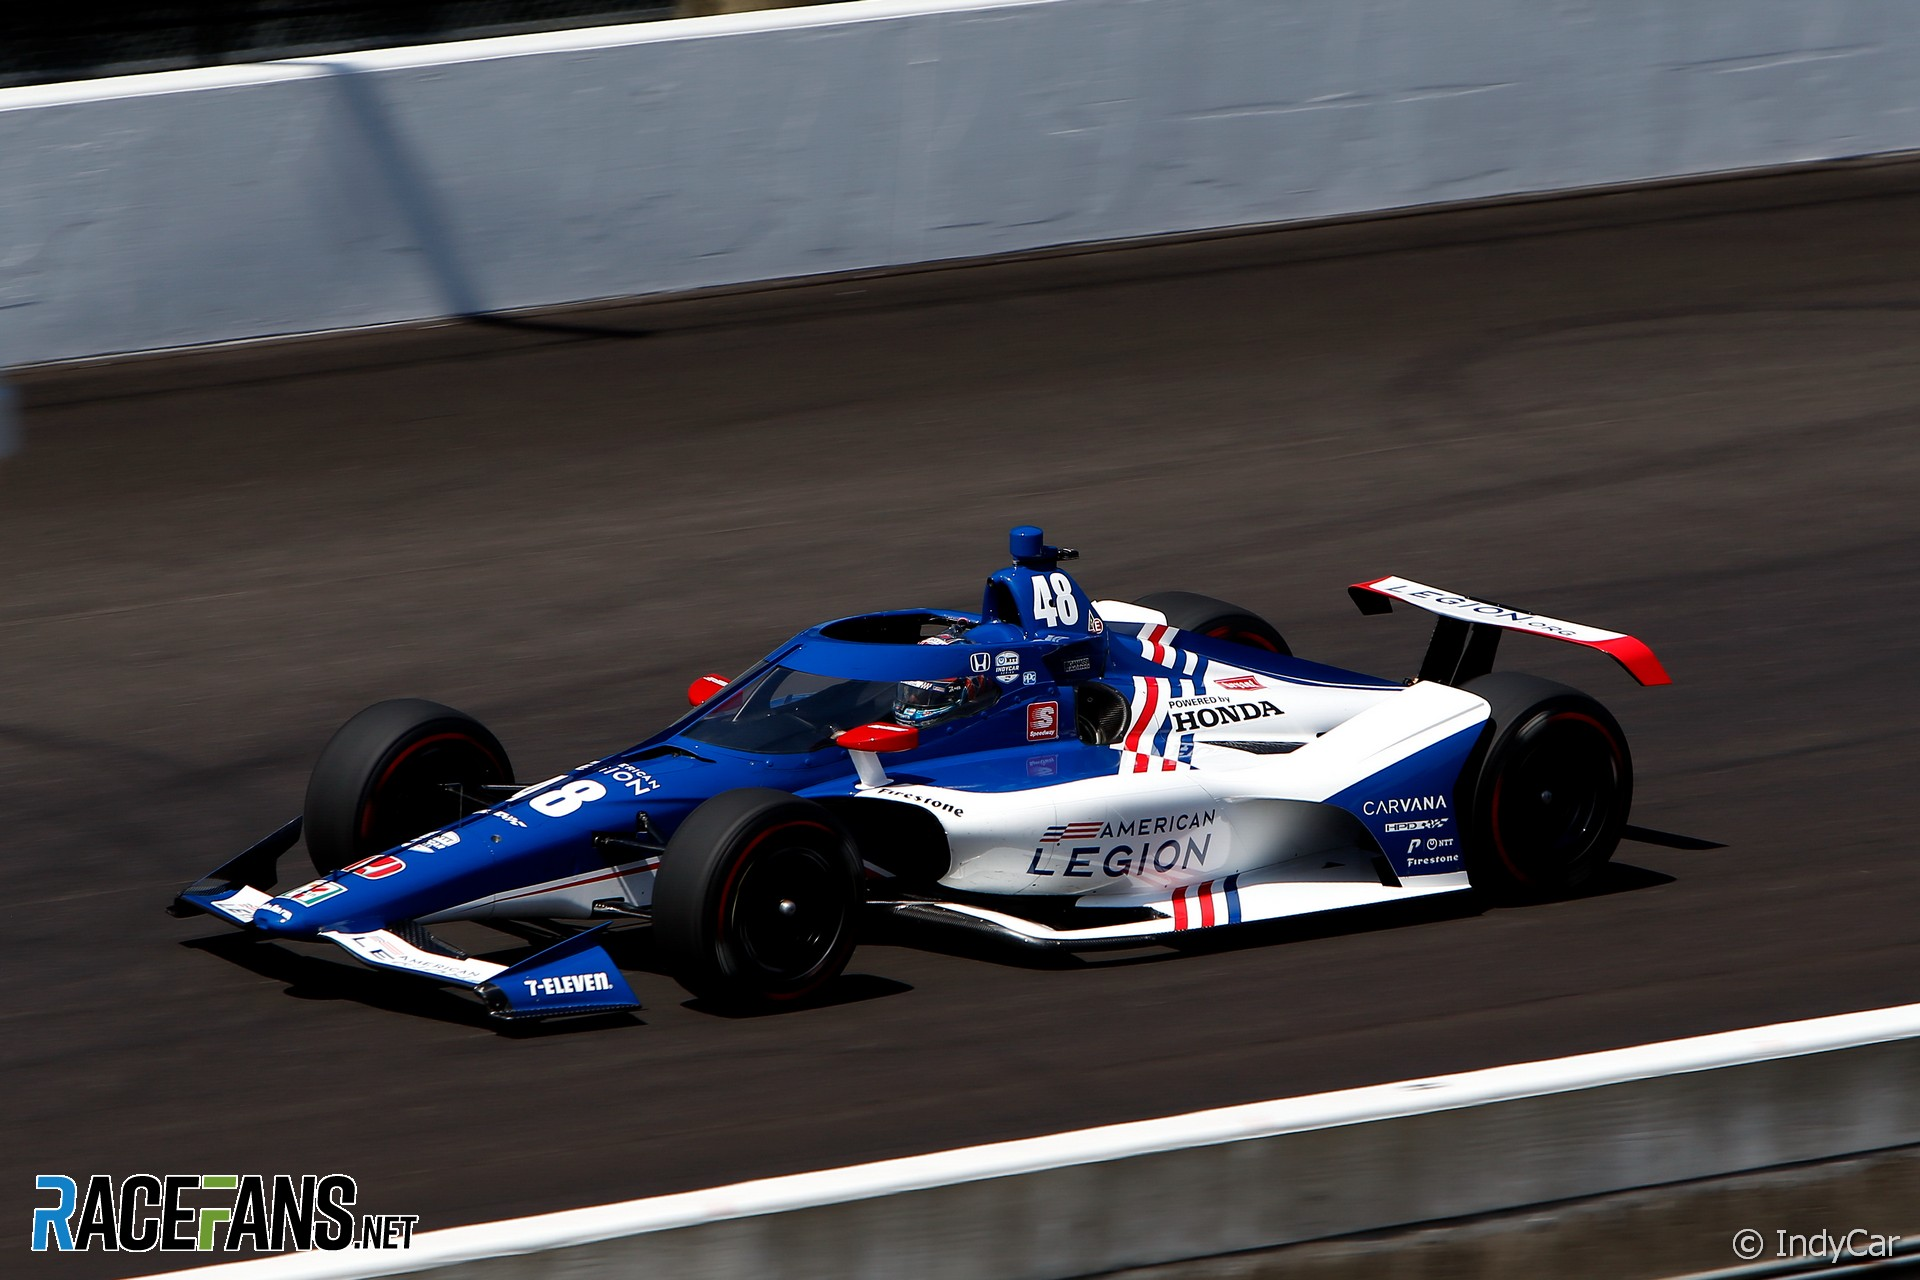 Tony Kanaan, Ganassi, IndyCar, Indianapolis Motor Speedway, 2021